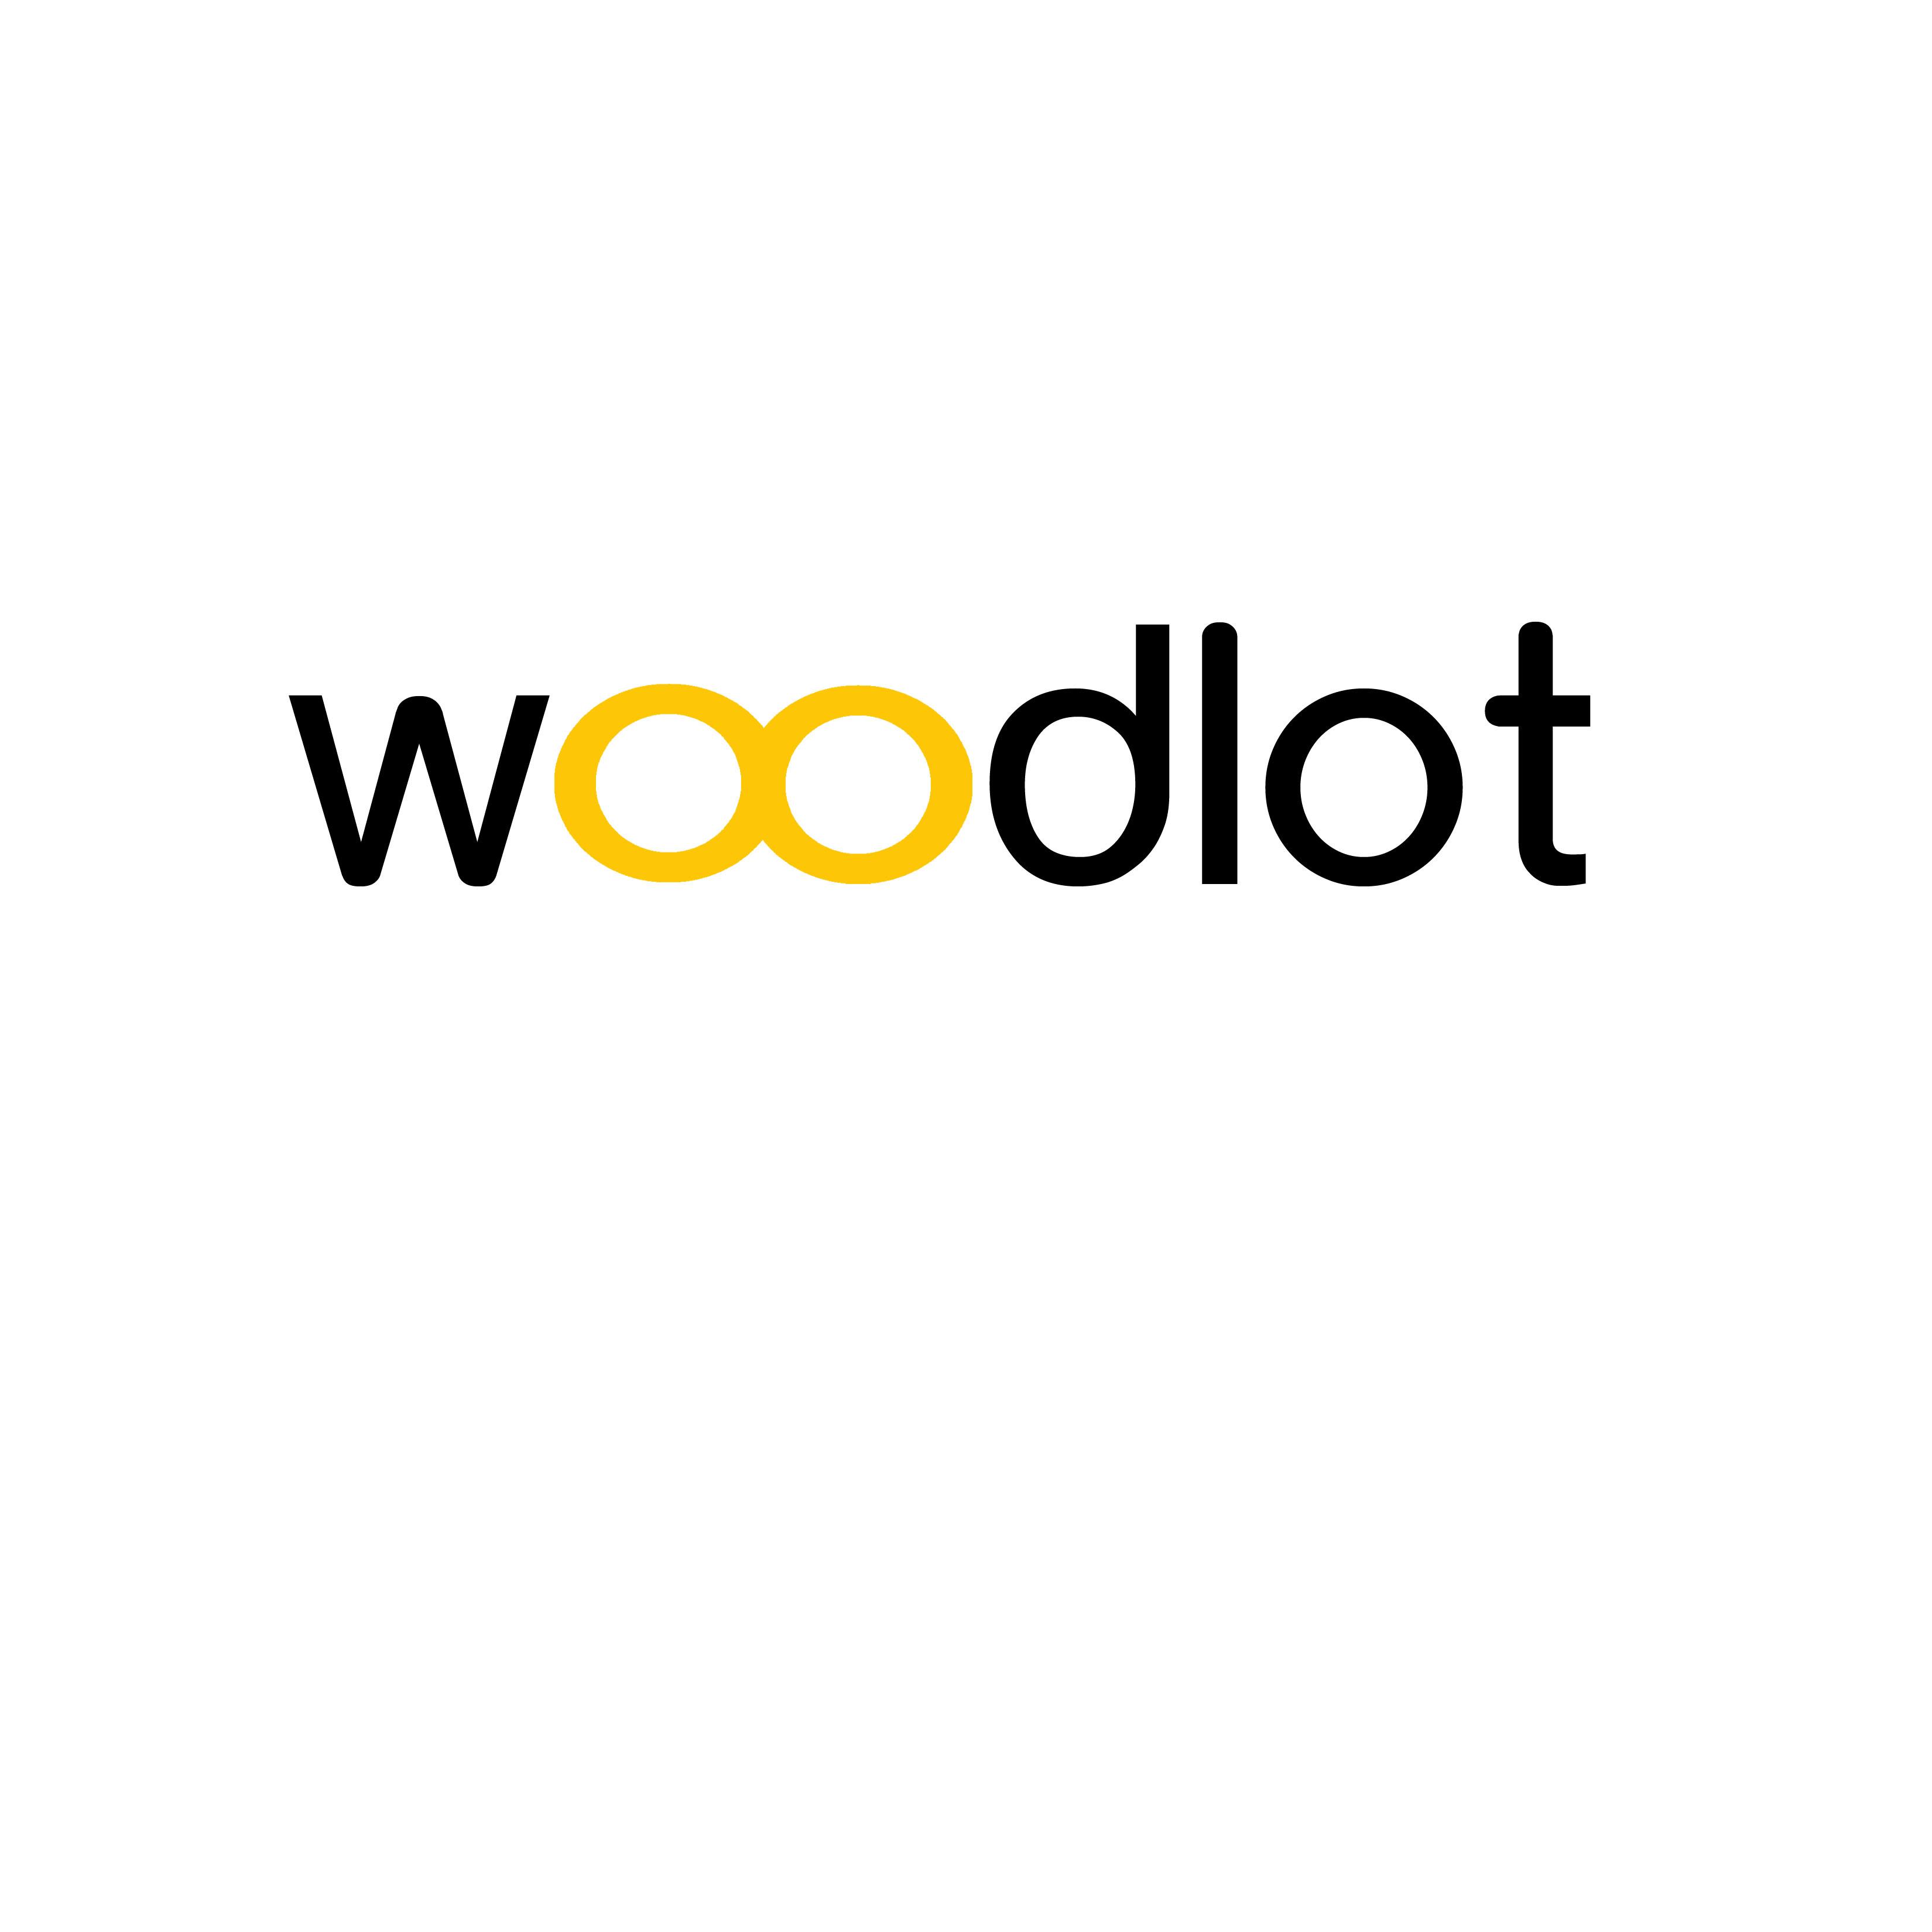 Logo Design by Allan Esclamado - Entry No. 11 in the Logo Design Contest Fun Logo Design for woodlot.